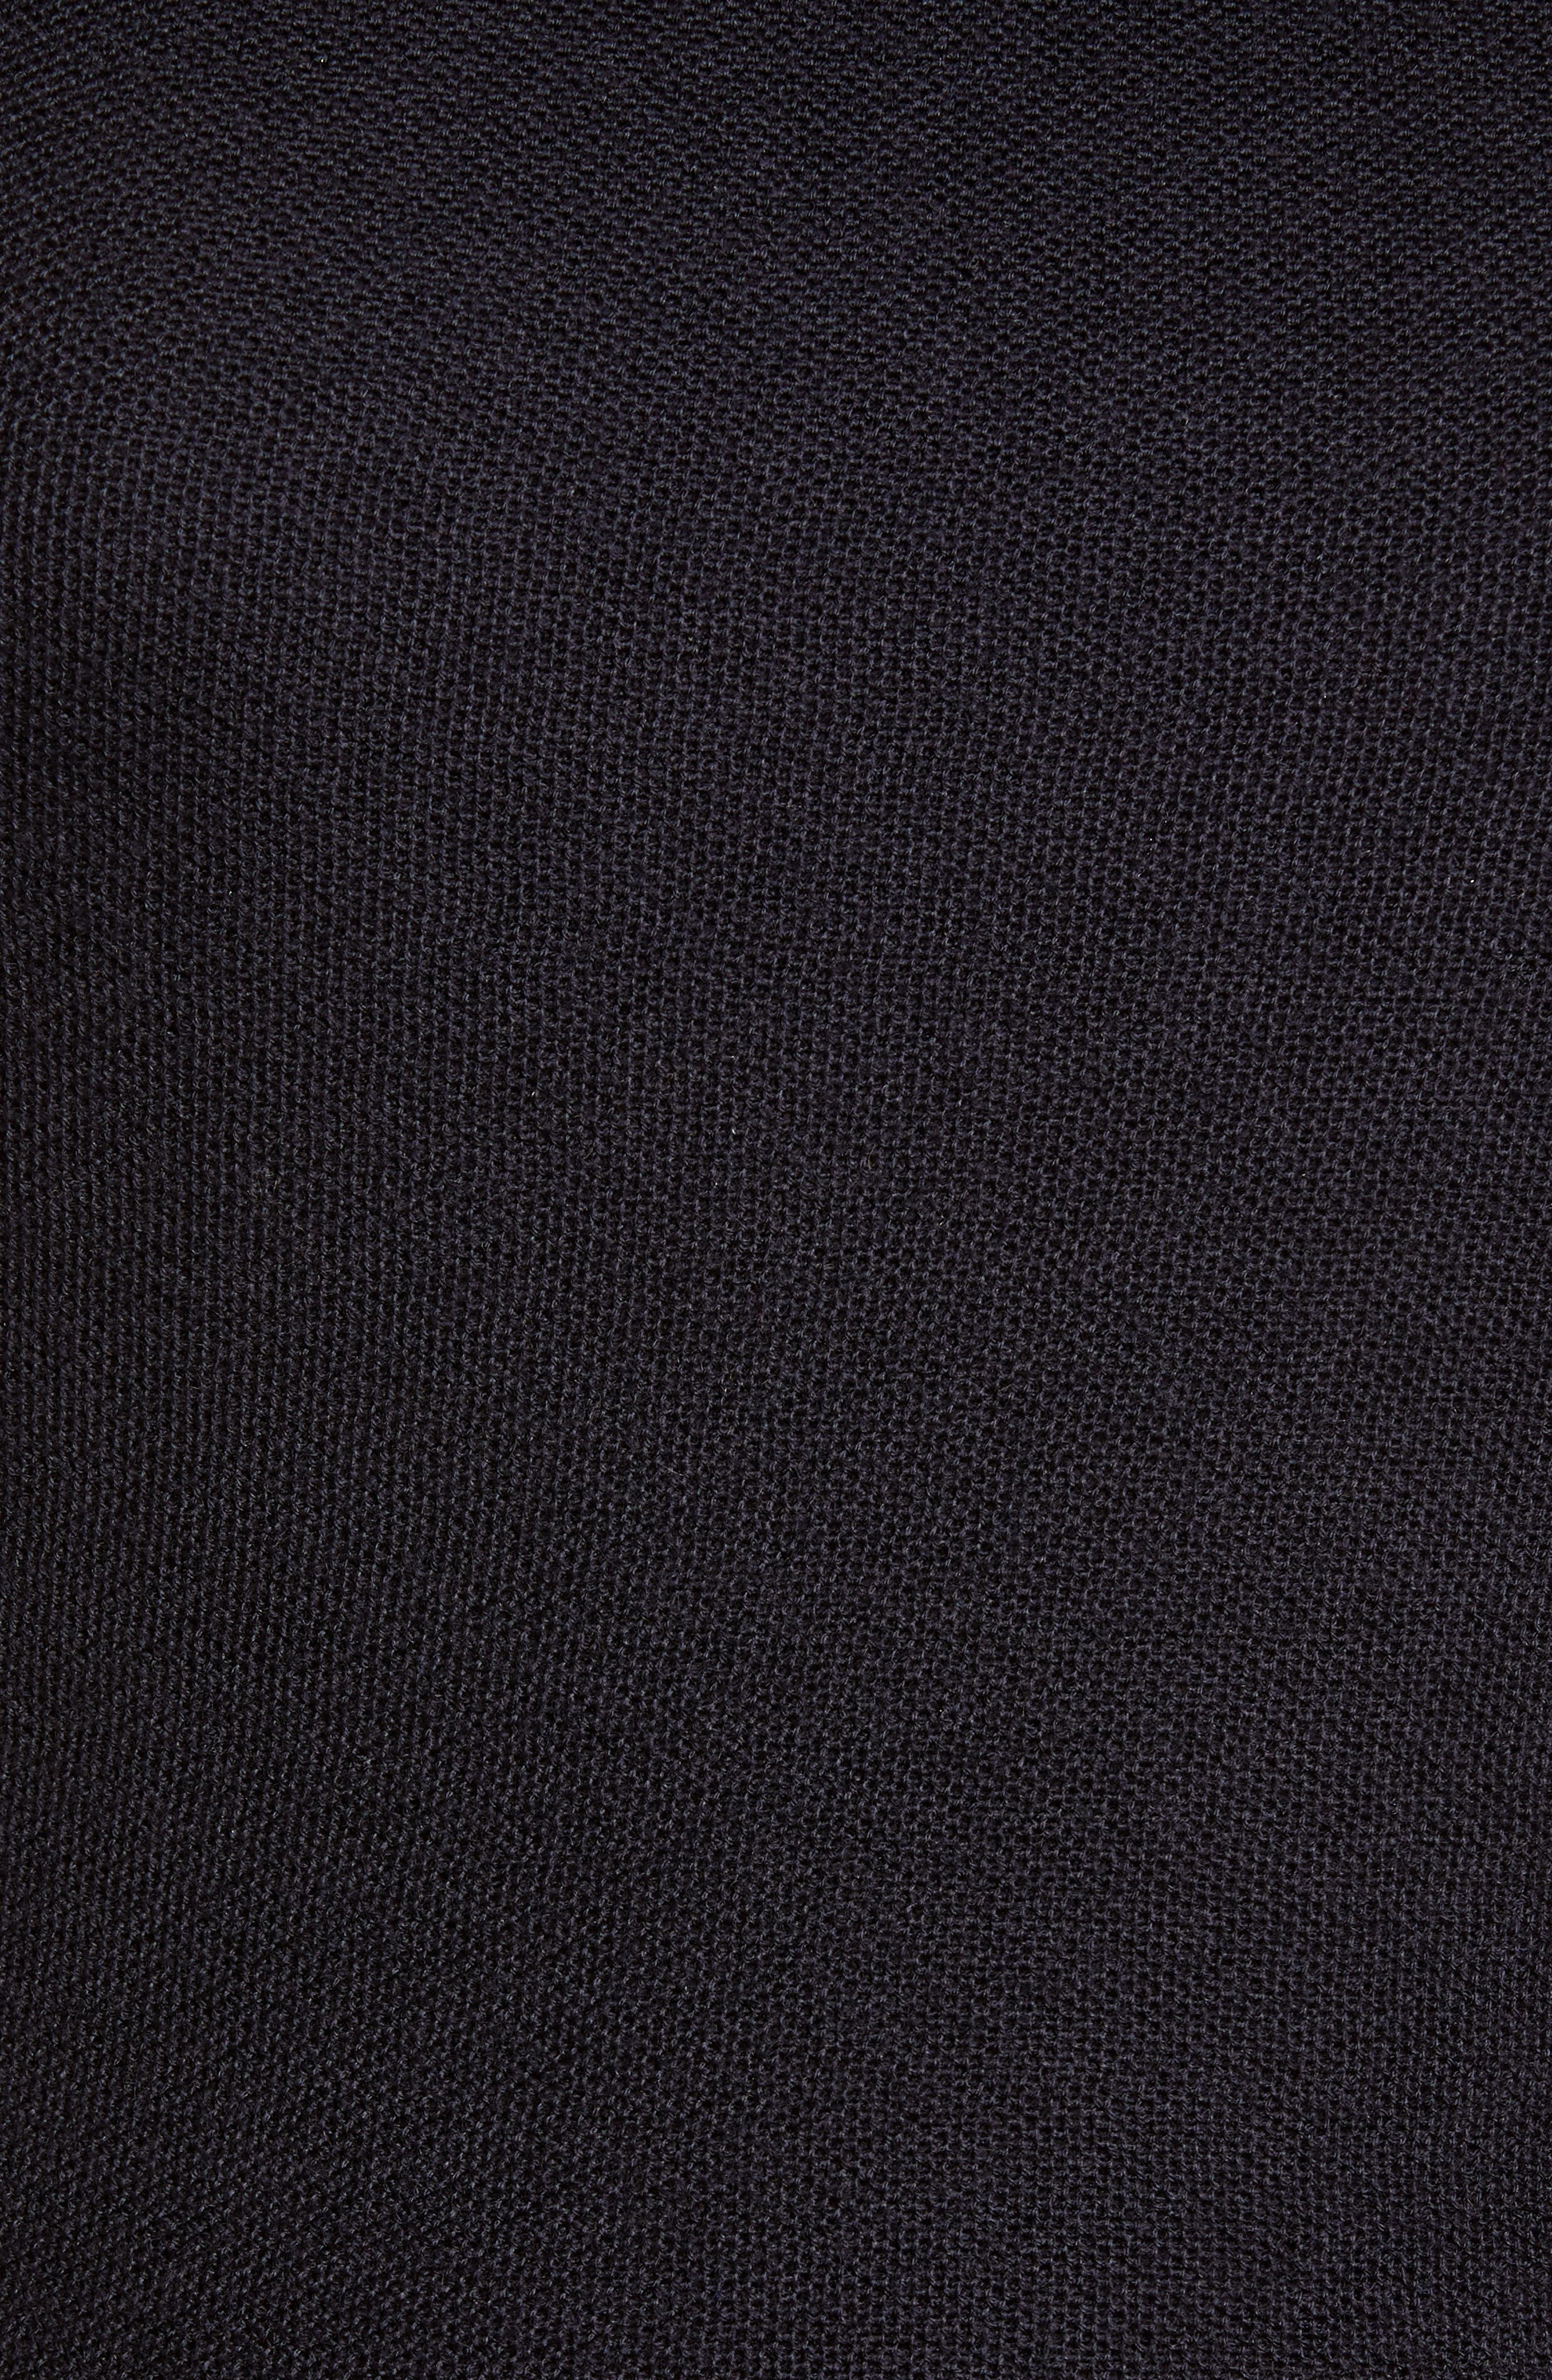 Fellie Sweater,                             Alternate thumbnail 6, color,                             Navy